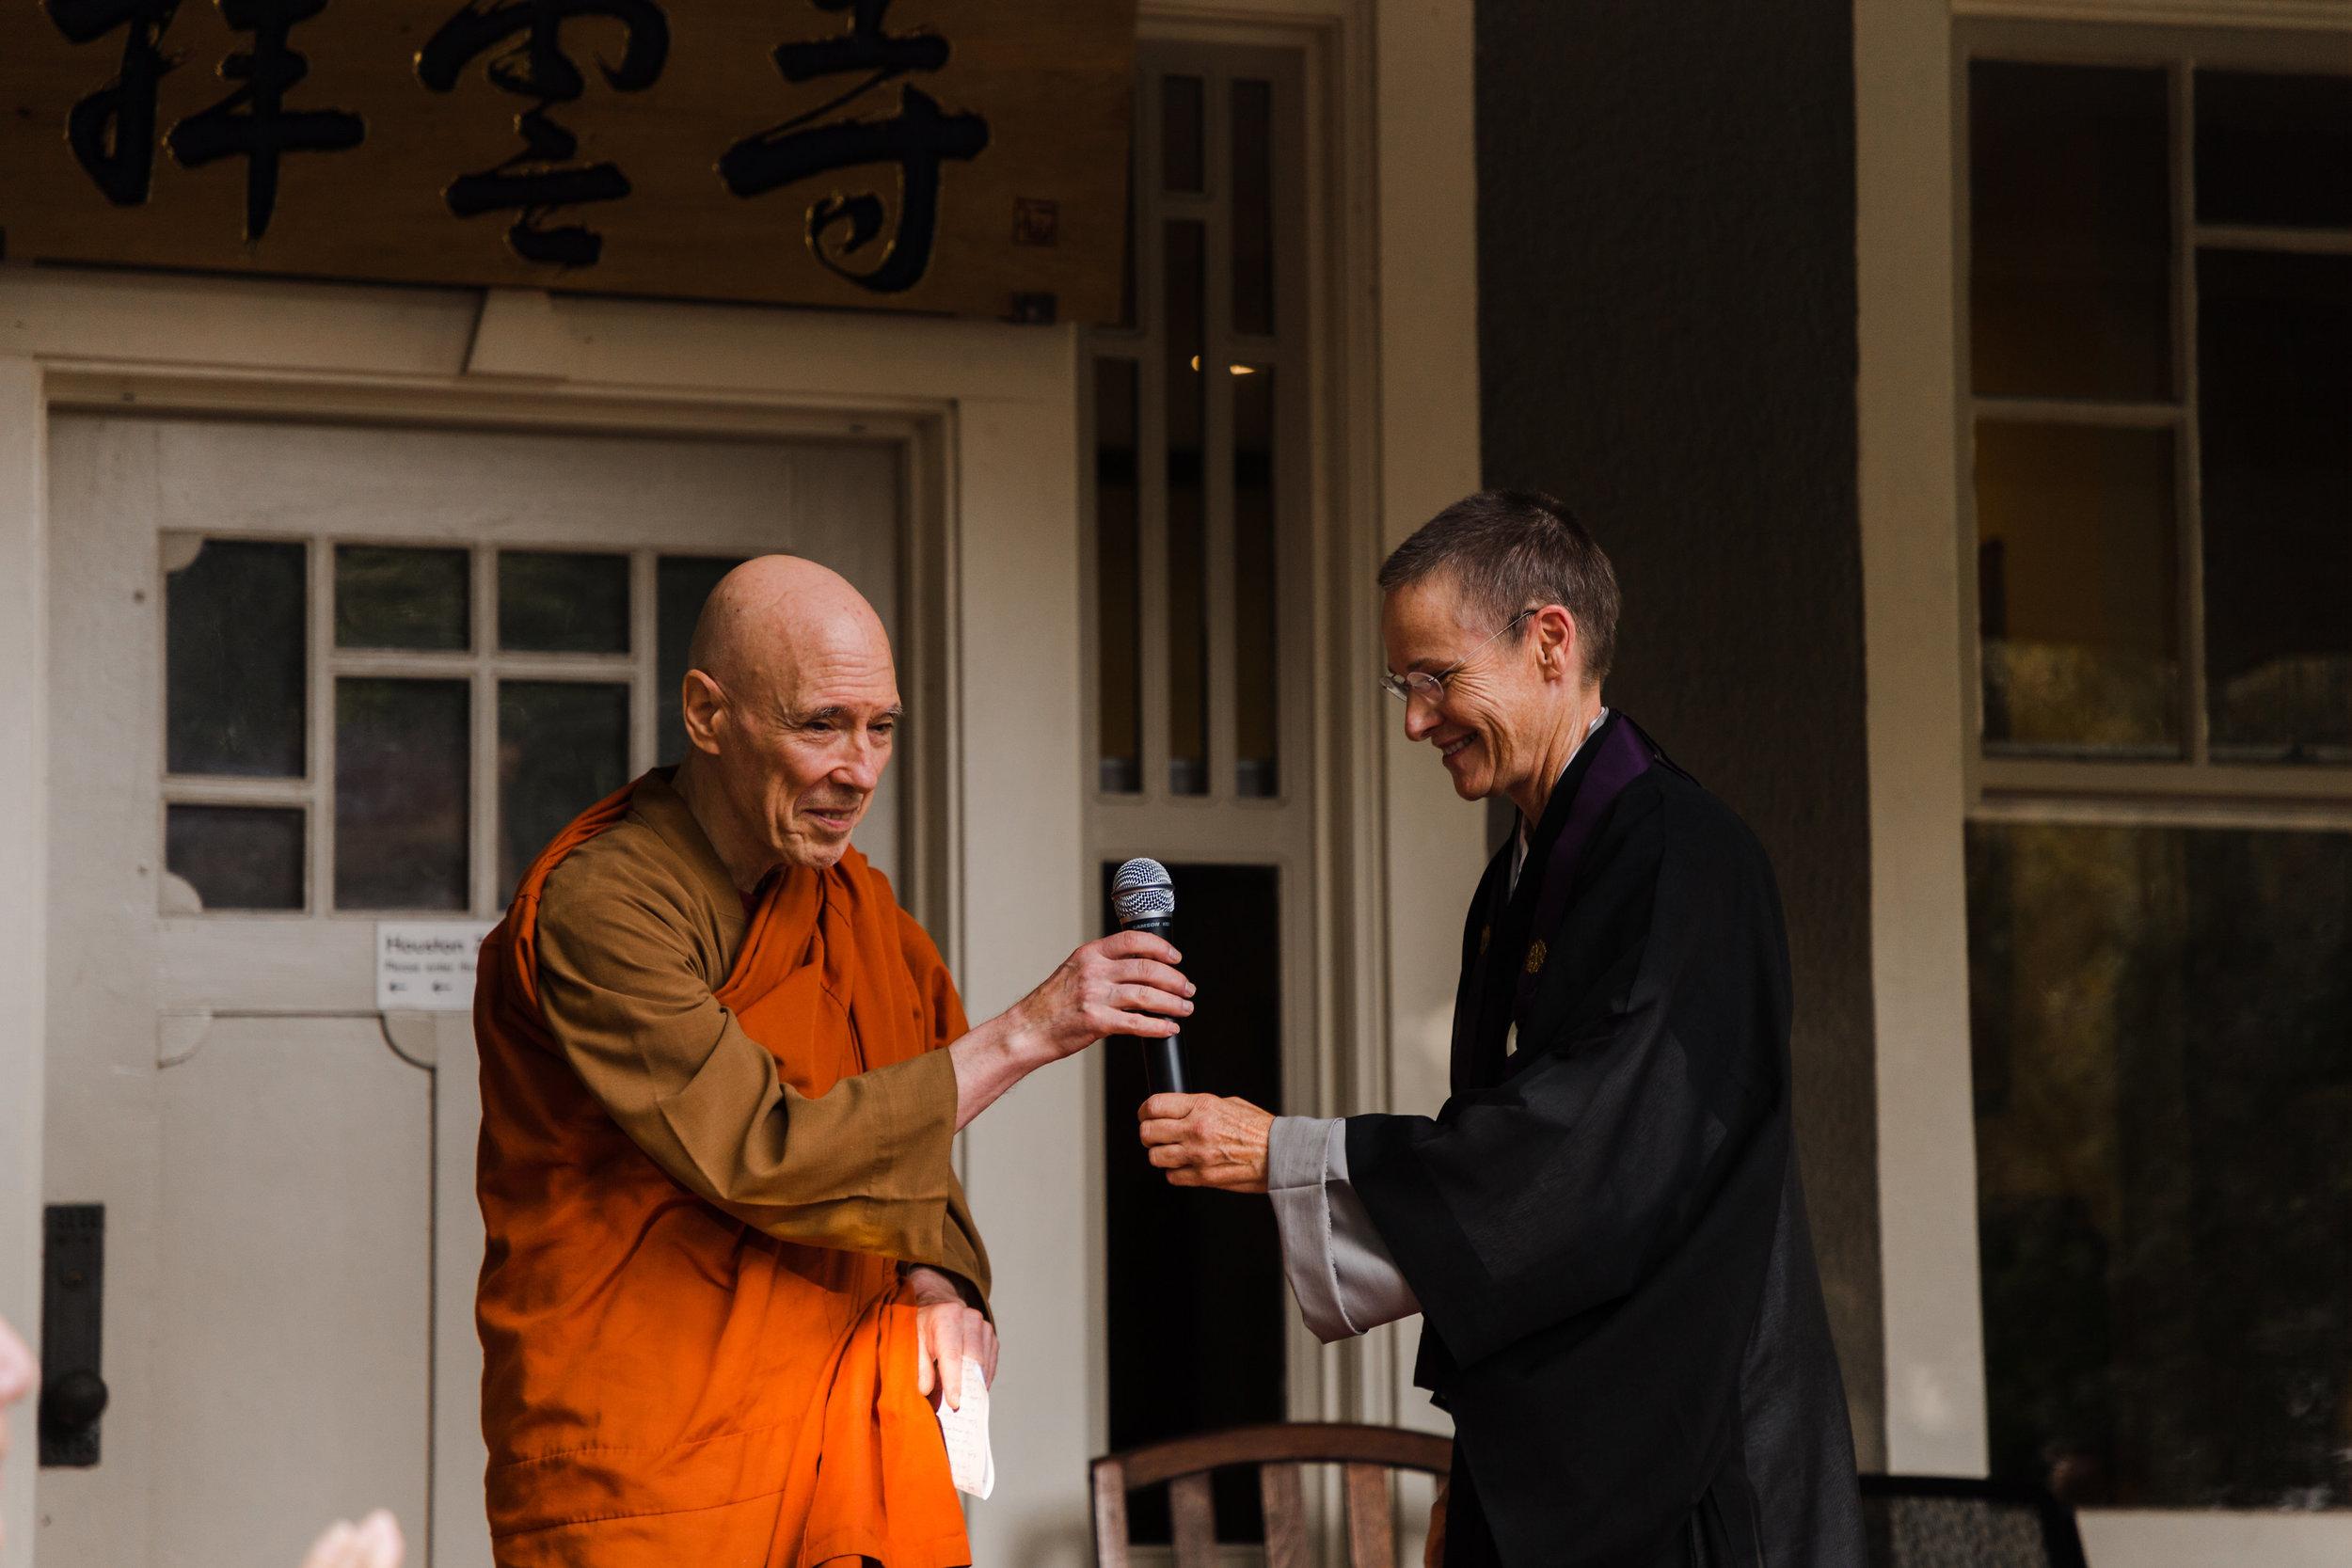 Bhikkhu-Bodhi-Global-Relief-Houston-Zen-Walk-27.jpg